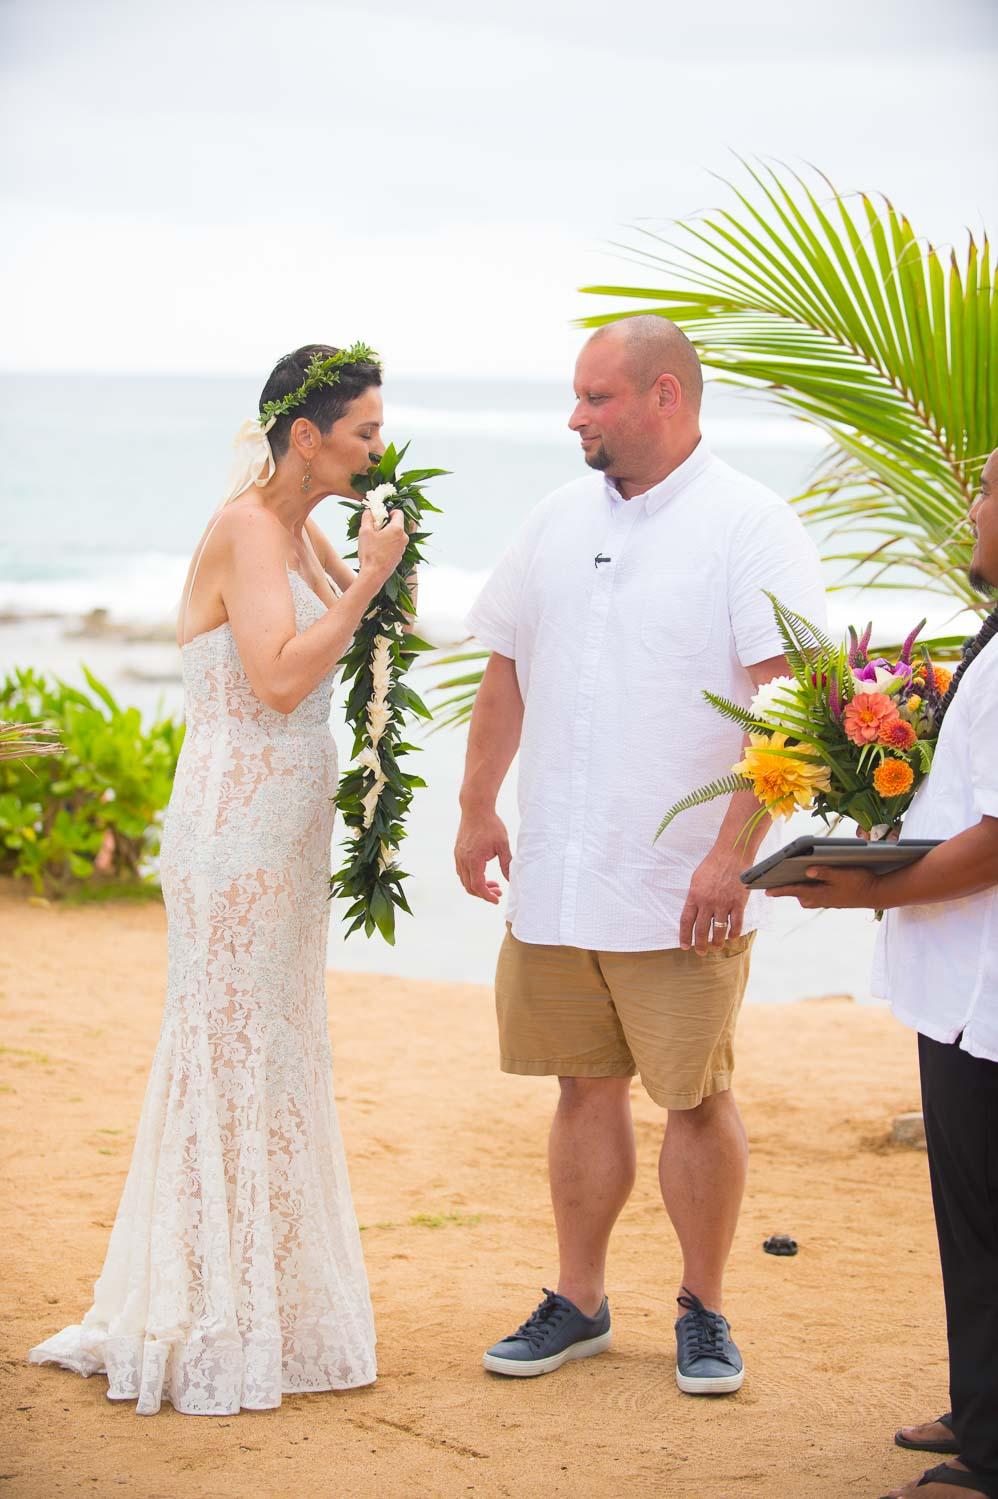 maui-wedding-photography-maui-wedding-venue-Tad-Craig-Photography-12.jpg